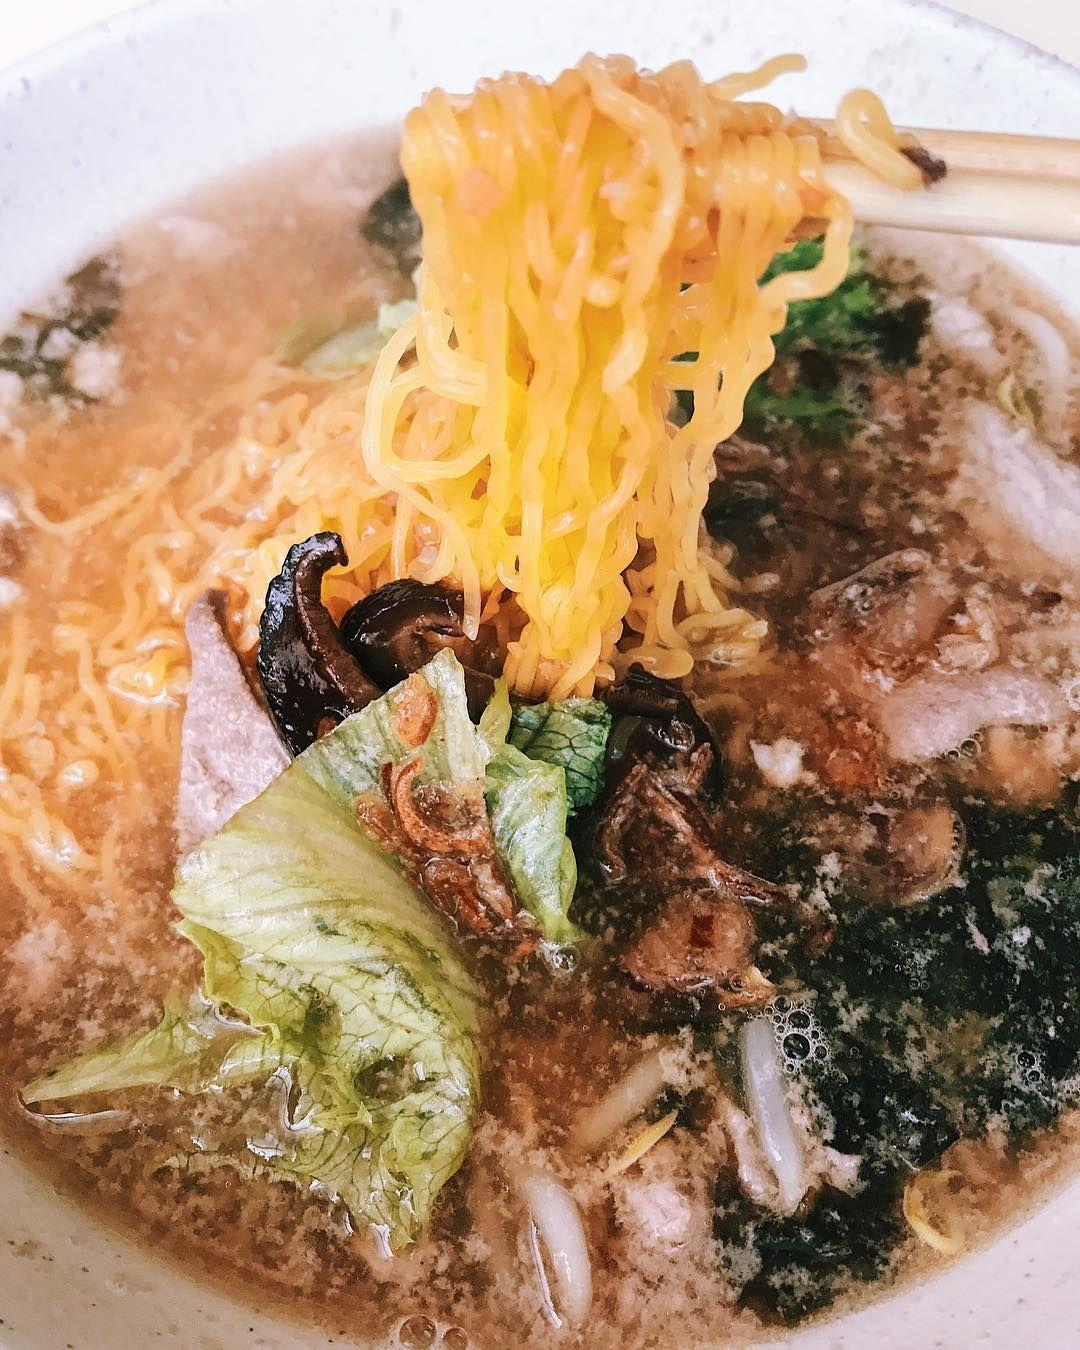 Soup Bak Chor Mee - Seng Kee Mushroom Minced Pork Noodle